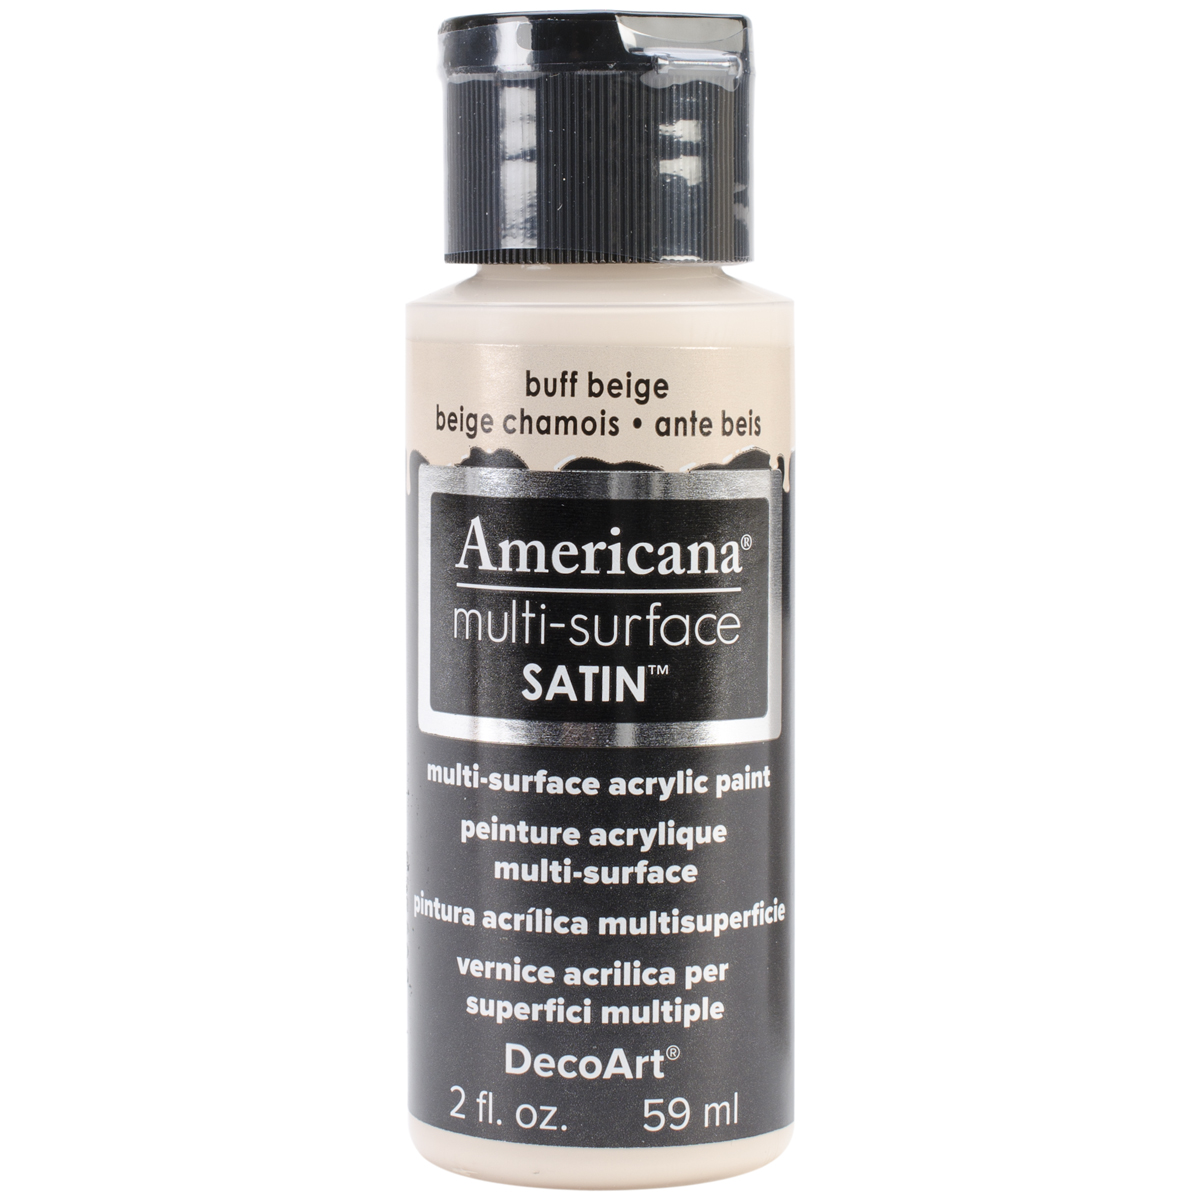 Americana Multi-Surface Satin Acrylic Paint 2oz-Buff Beige